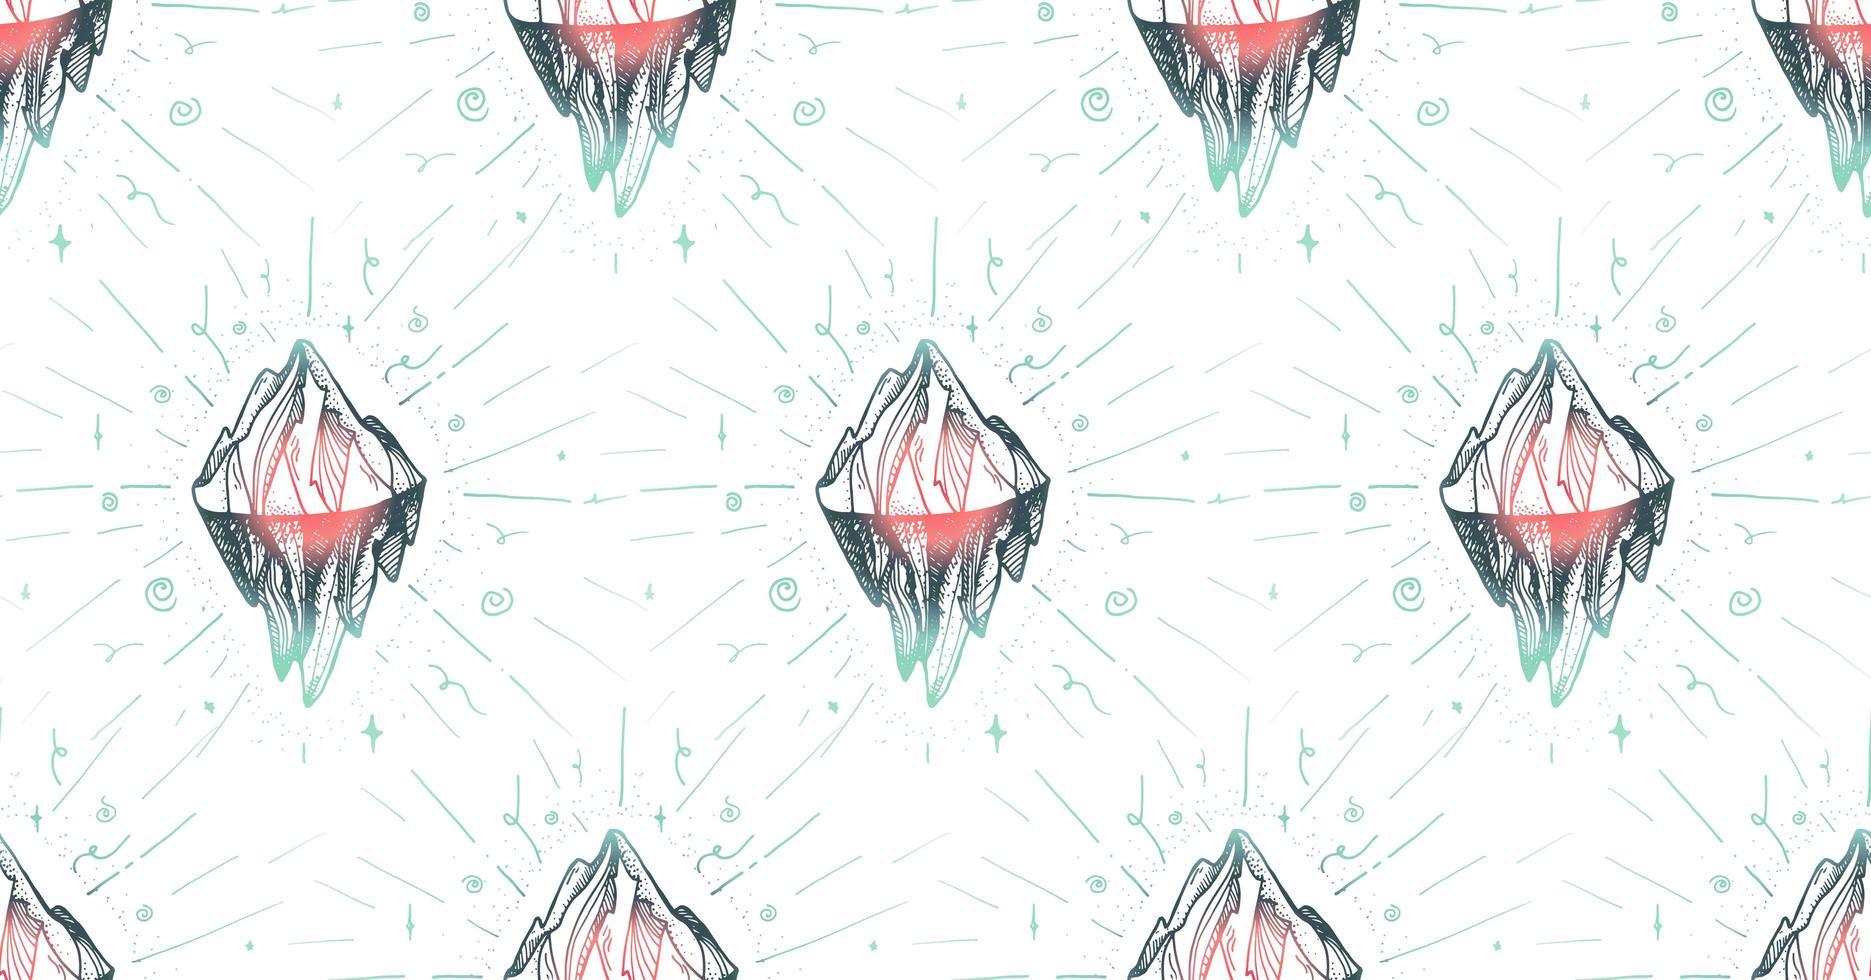 pico do iceberg da montanha vetor